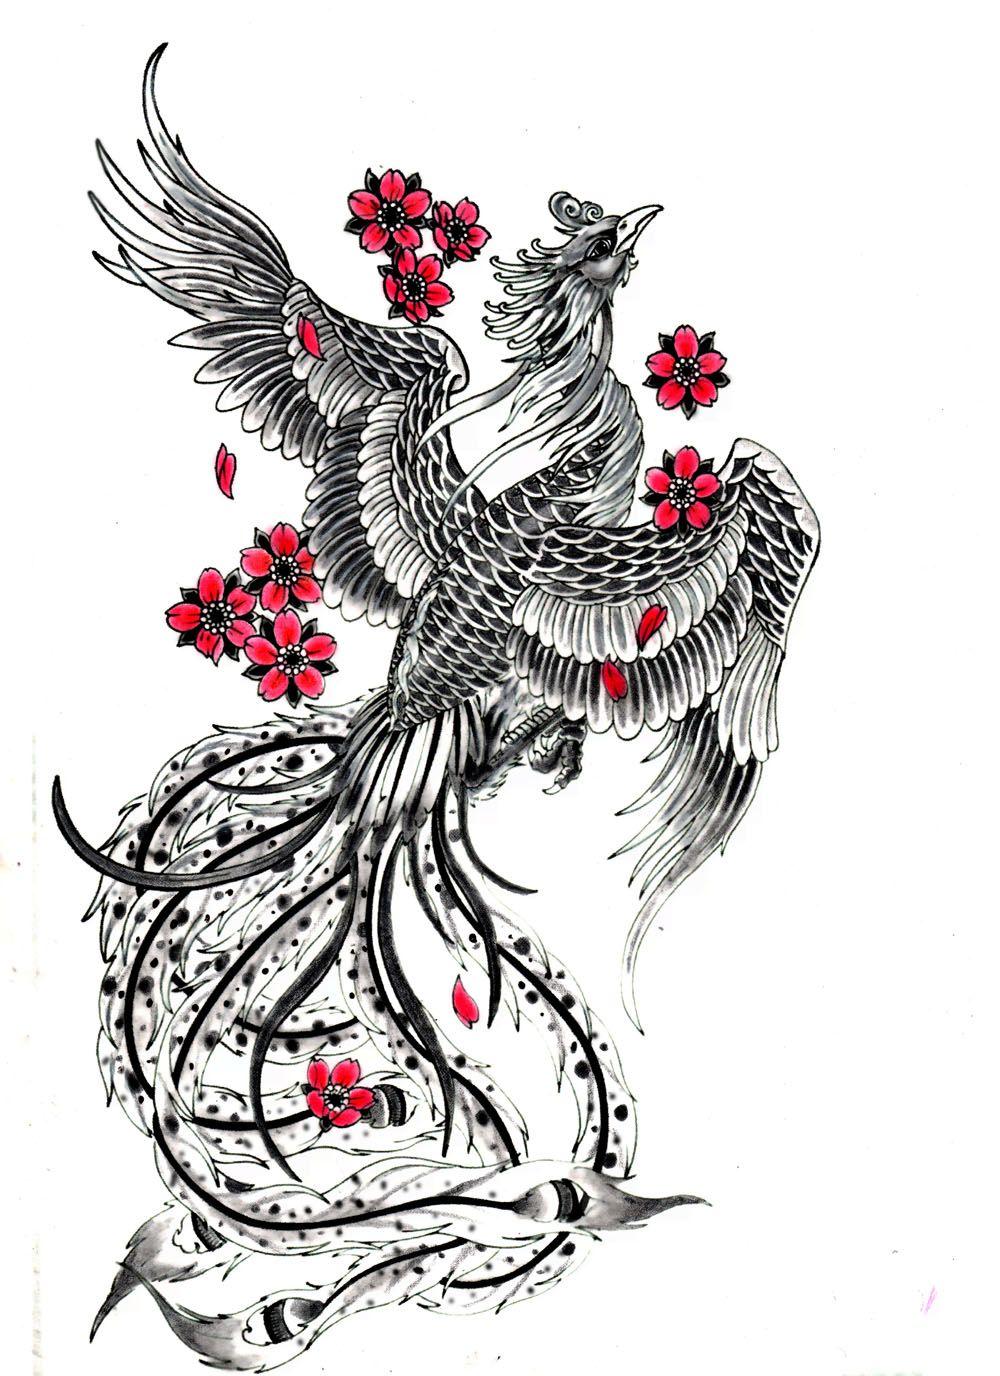 Tatouage phoenix page 30 tattoocompris tatoos pinterest tatouage phoenix tatouages et - Tatouage phoenix bras ...